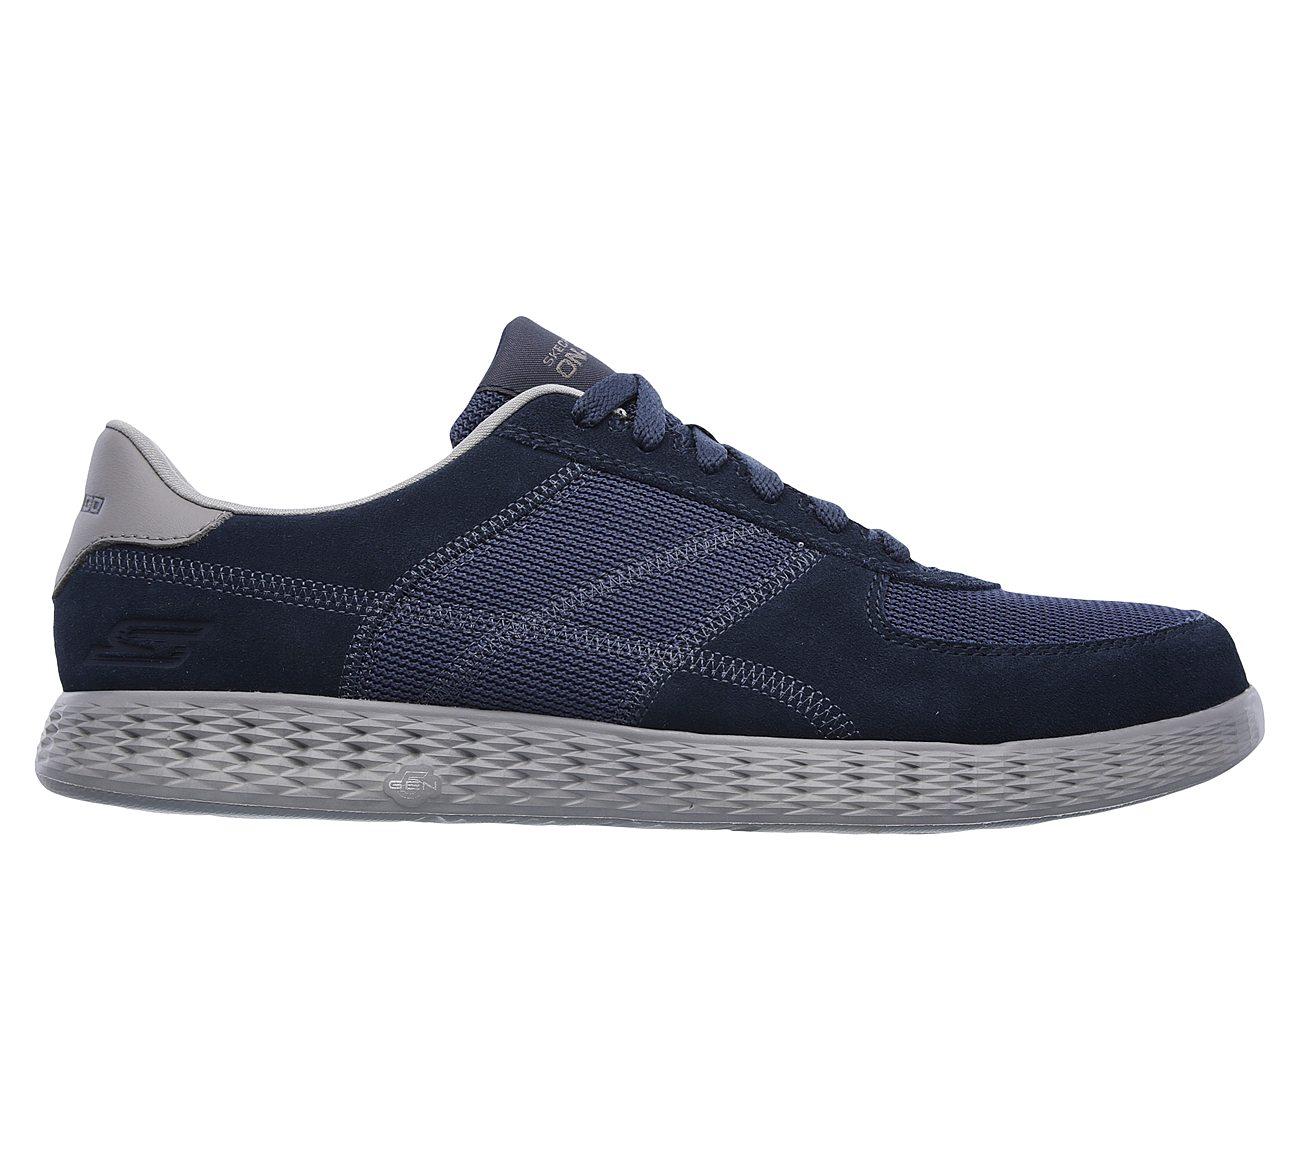 buy skechers skechers on the go glide virtue skechers performance shoes only. Black Bedroom Furniture Sets. Home Design Ideas